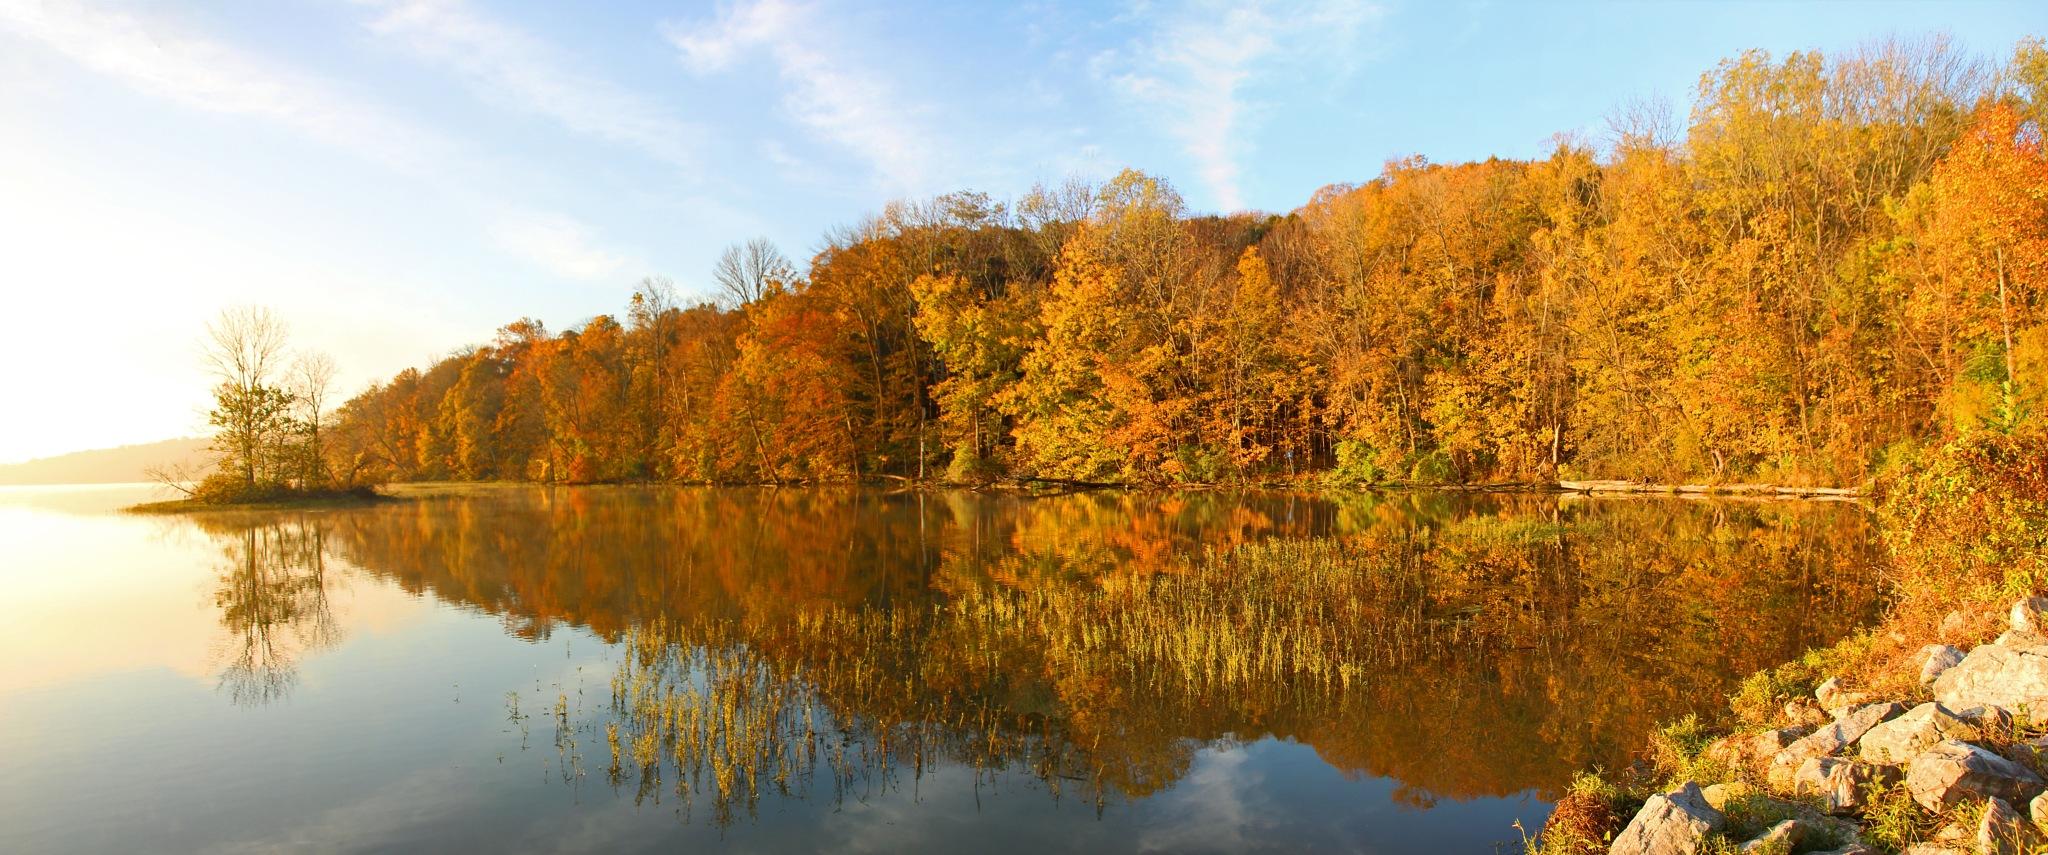 October Panorama by Virgil Seger